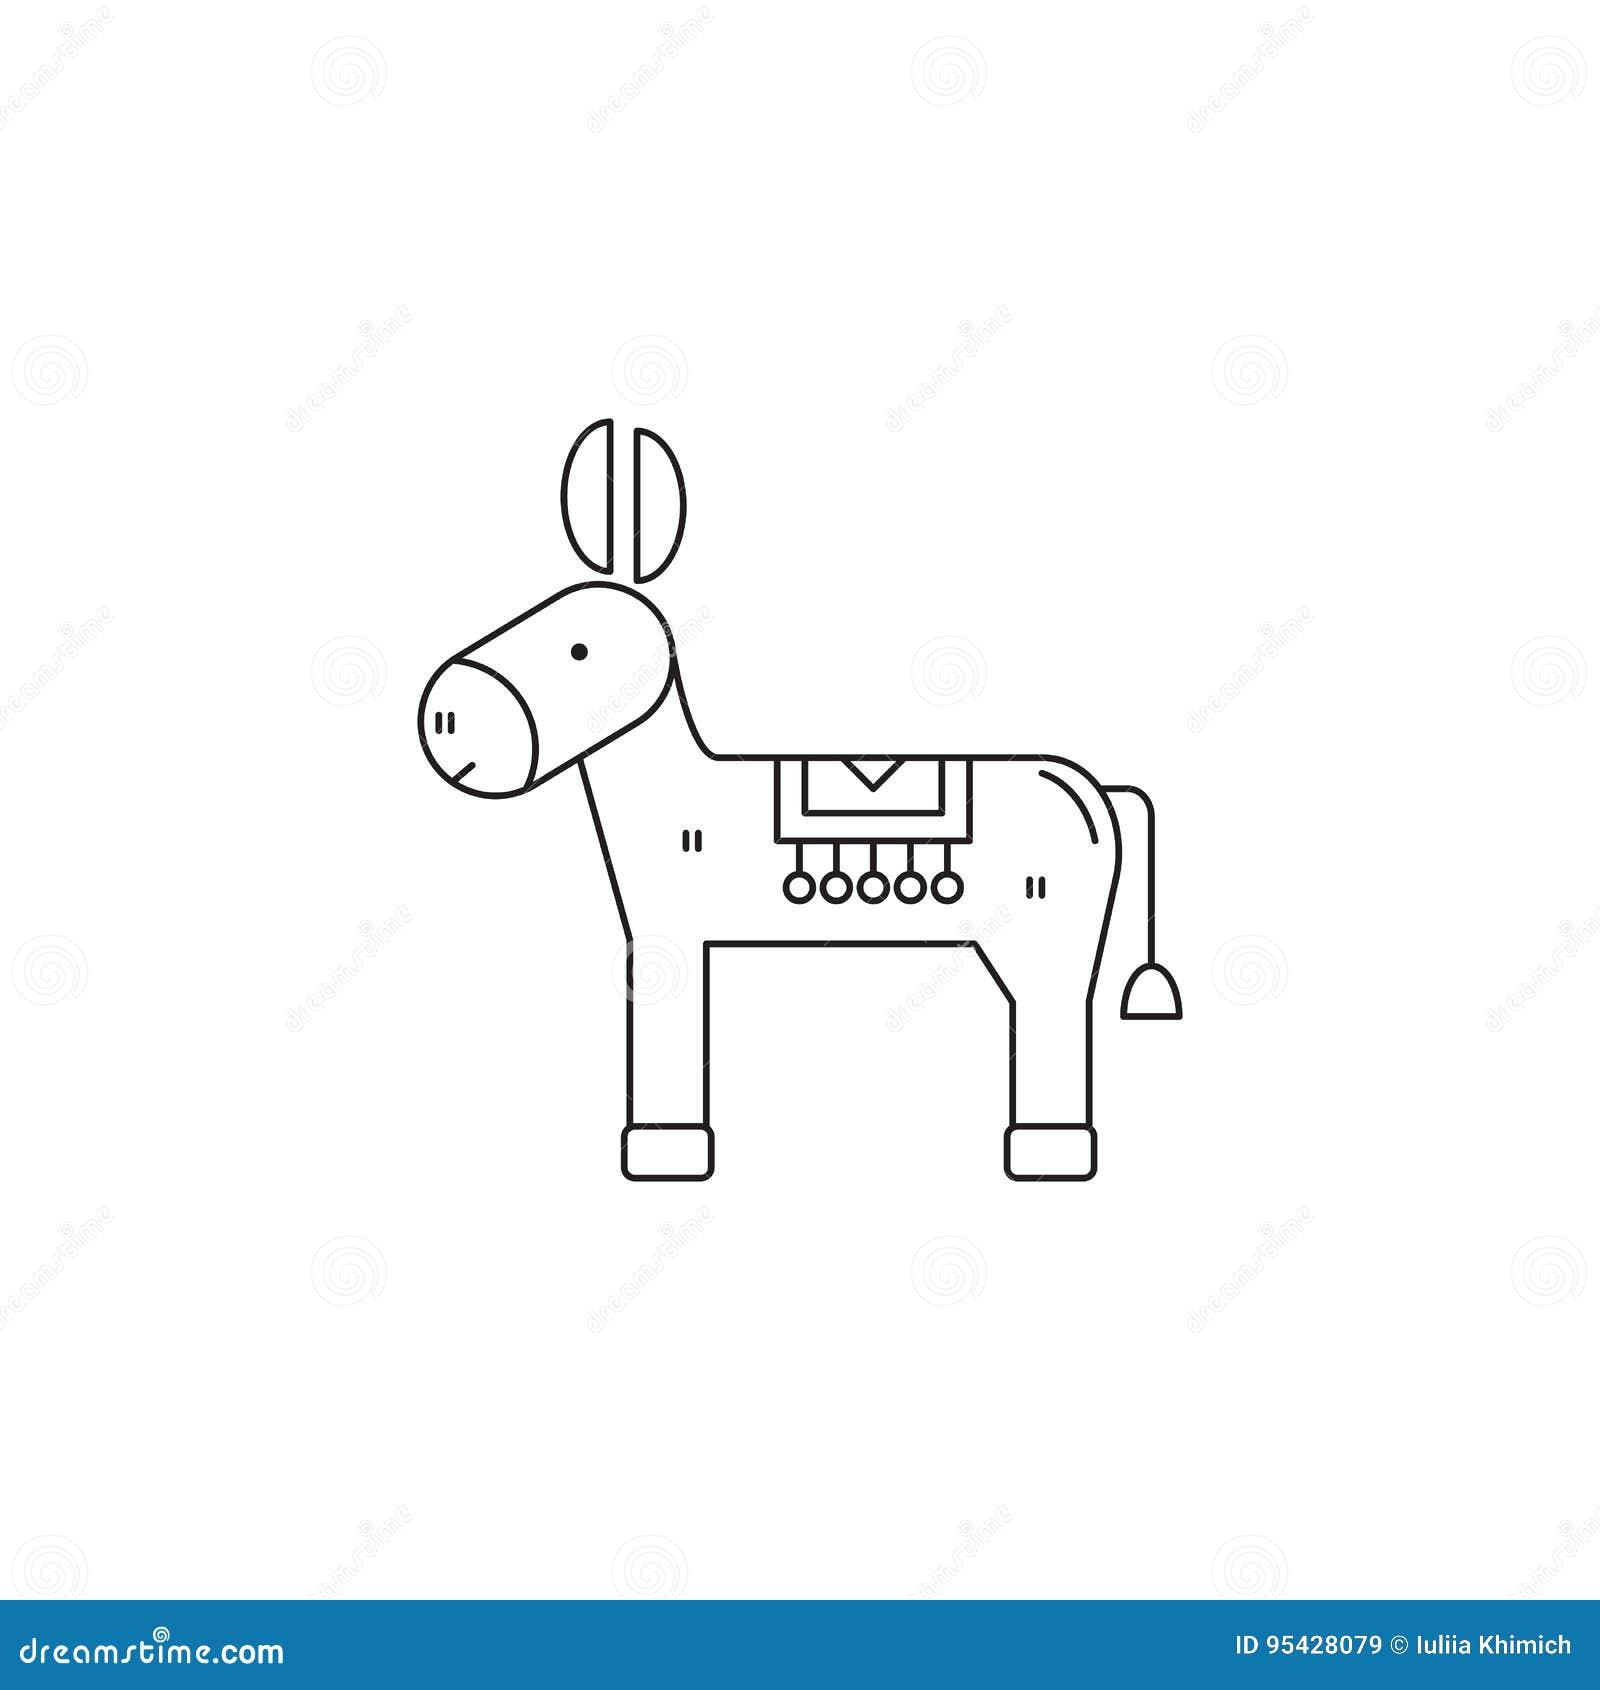 Donkey line icon stock vector. Illustration of burro - 95428079